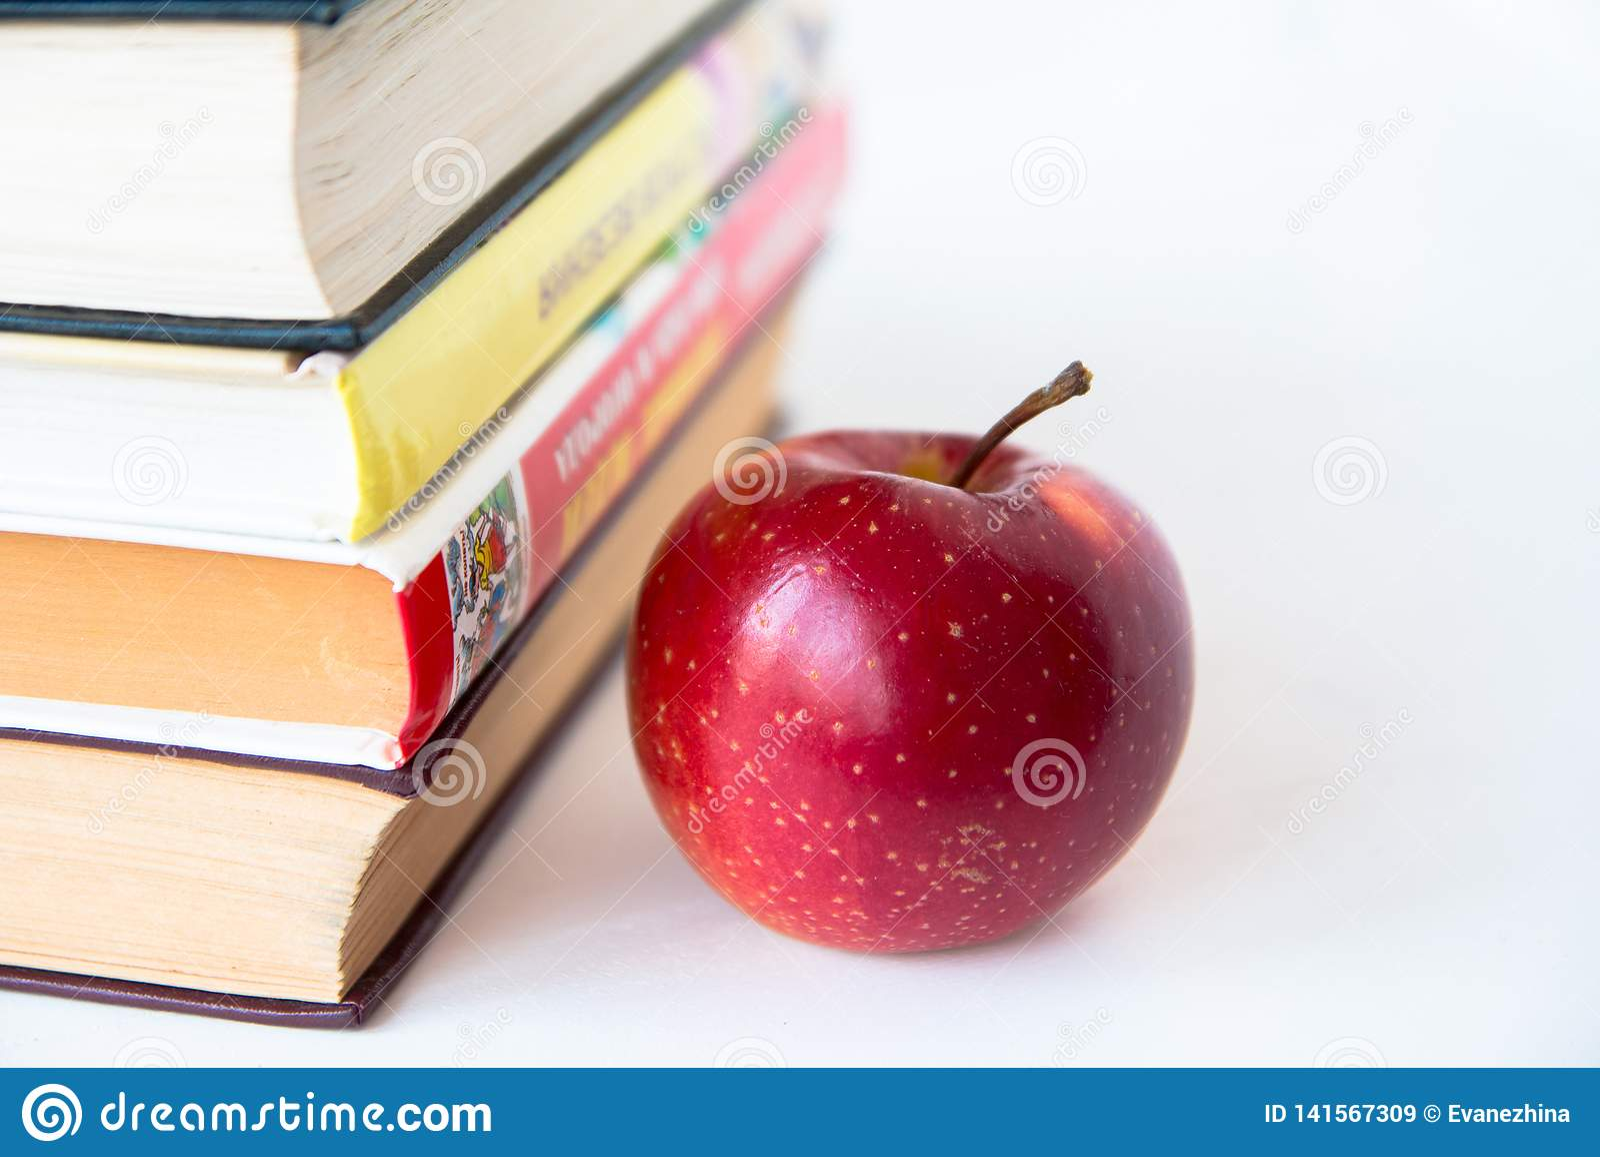 Roter reifer saftiger Apfel nahe Büchern